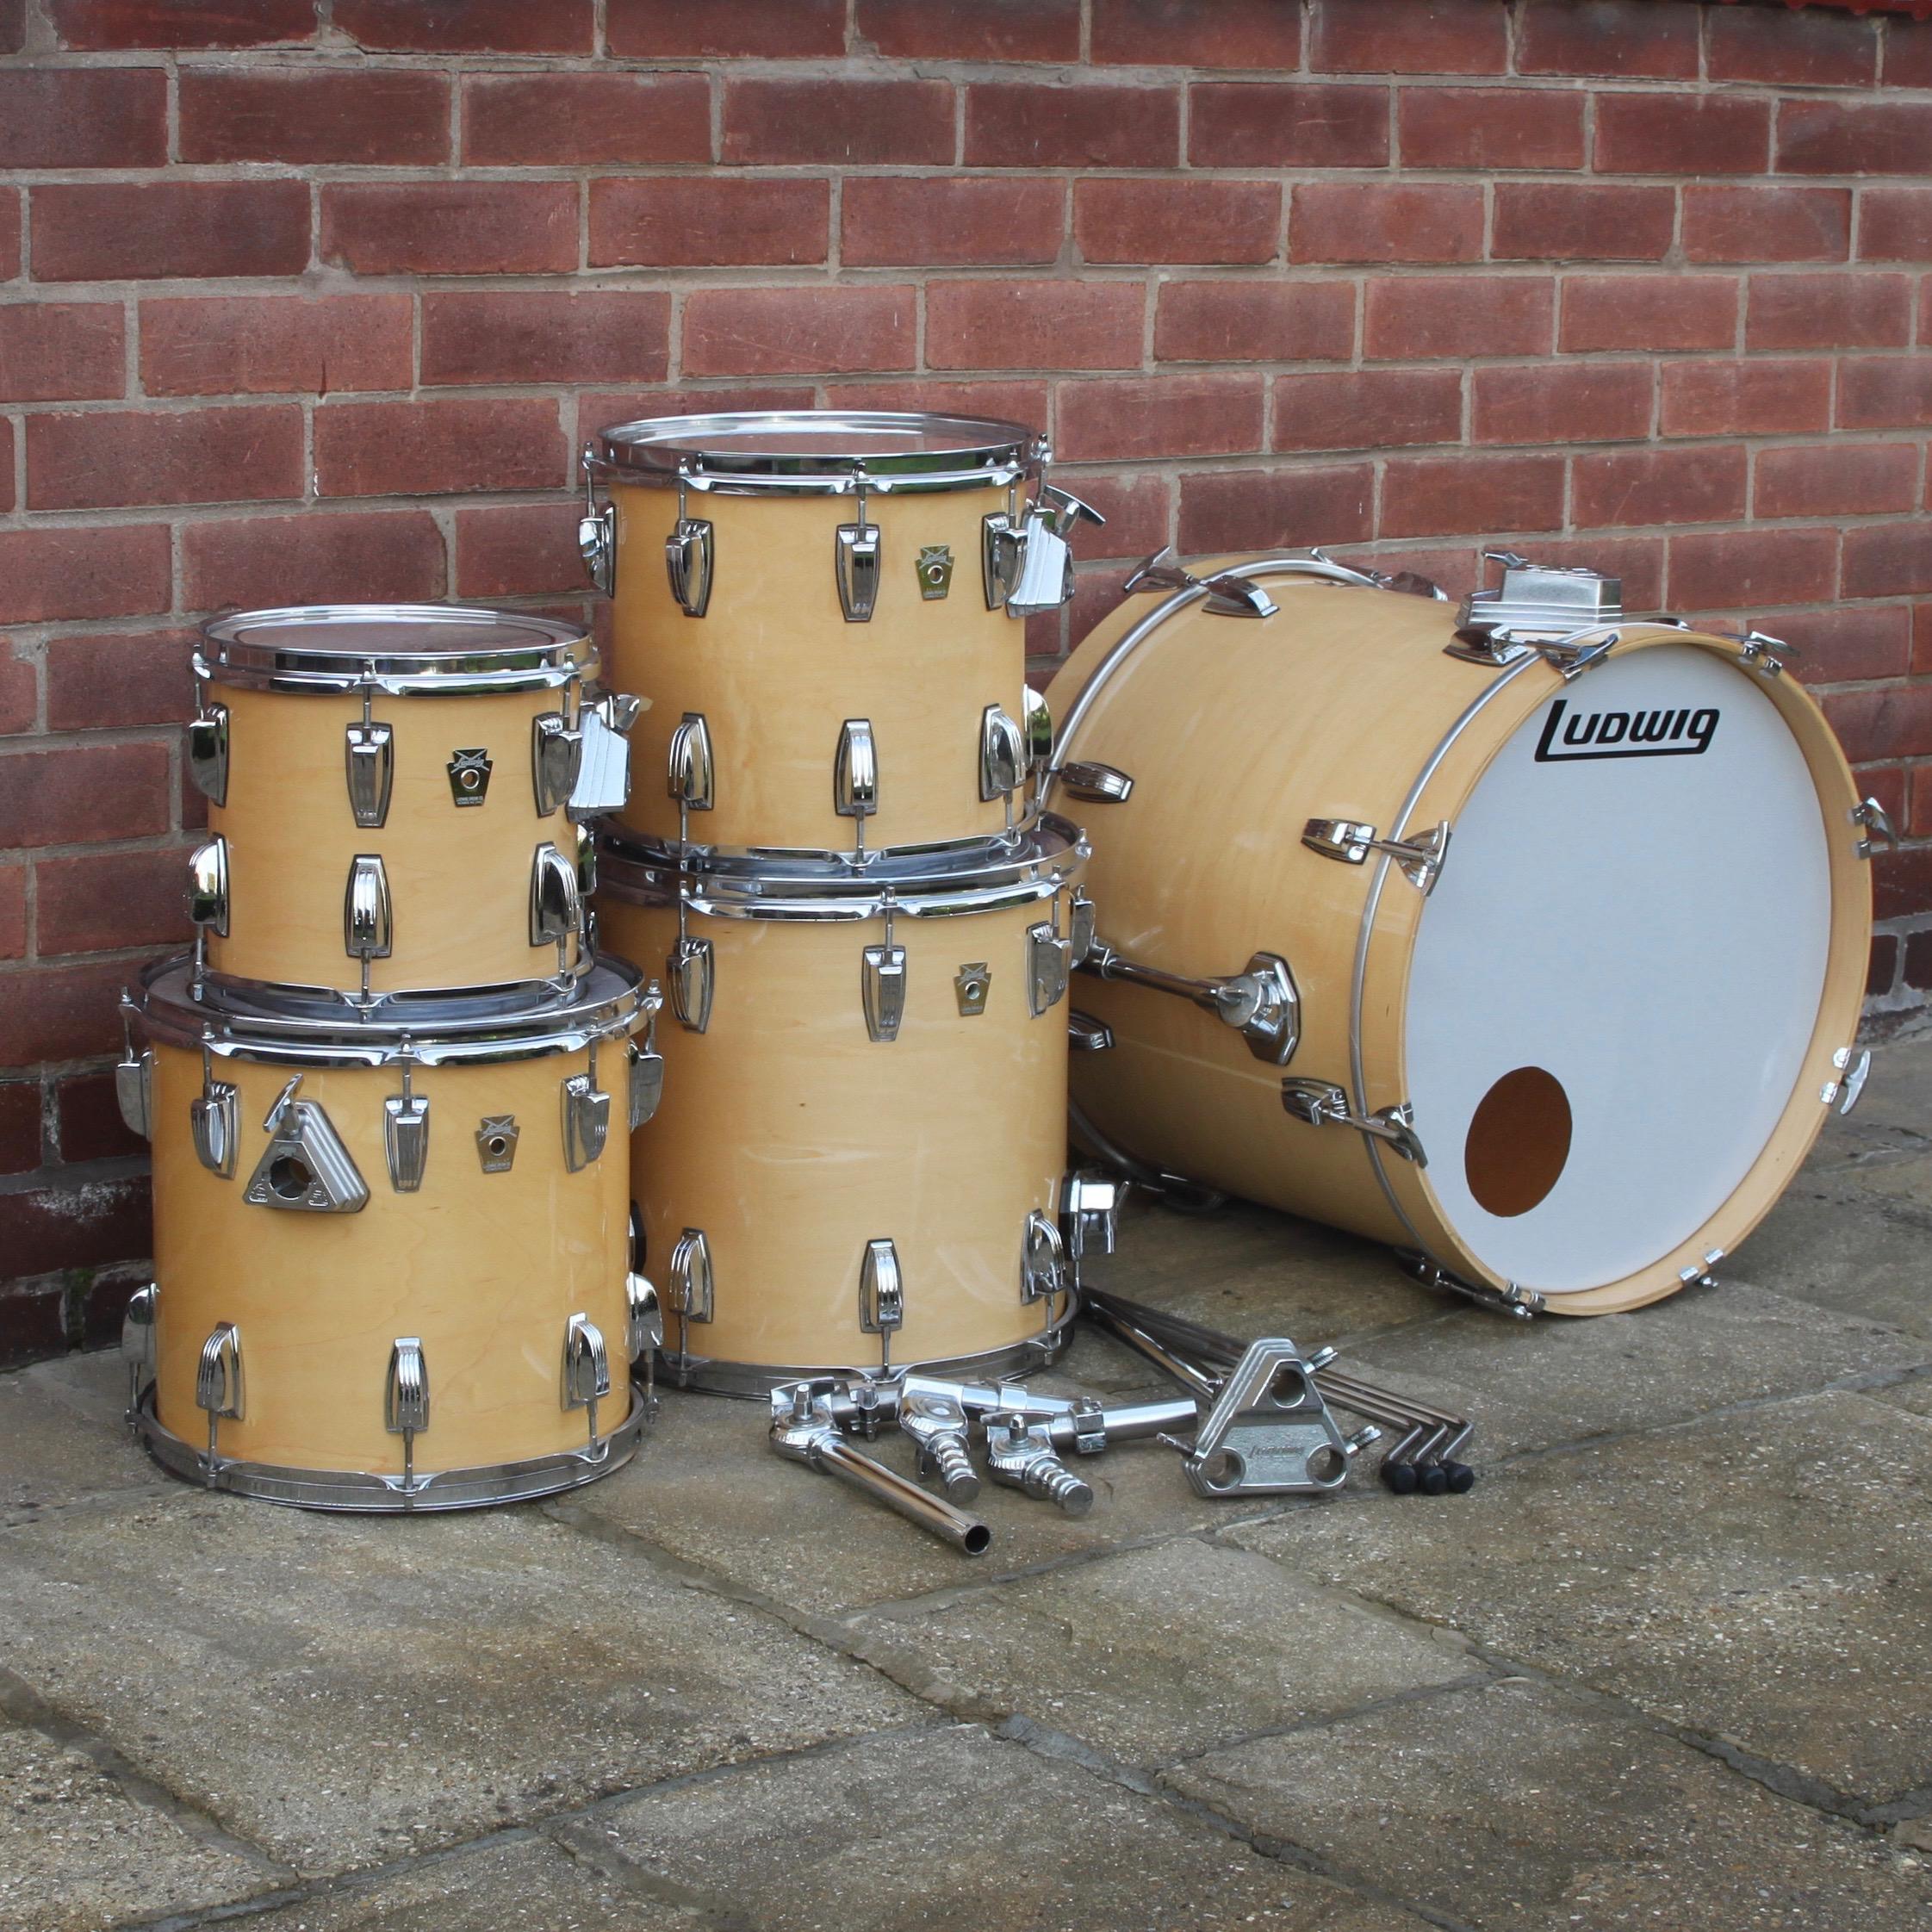 Vintage Ludwig Classic Maple Natural 5 Piece Drum Kit -